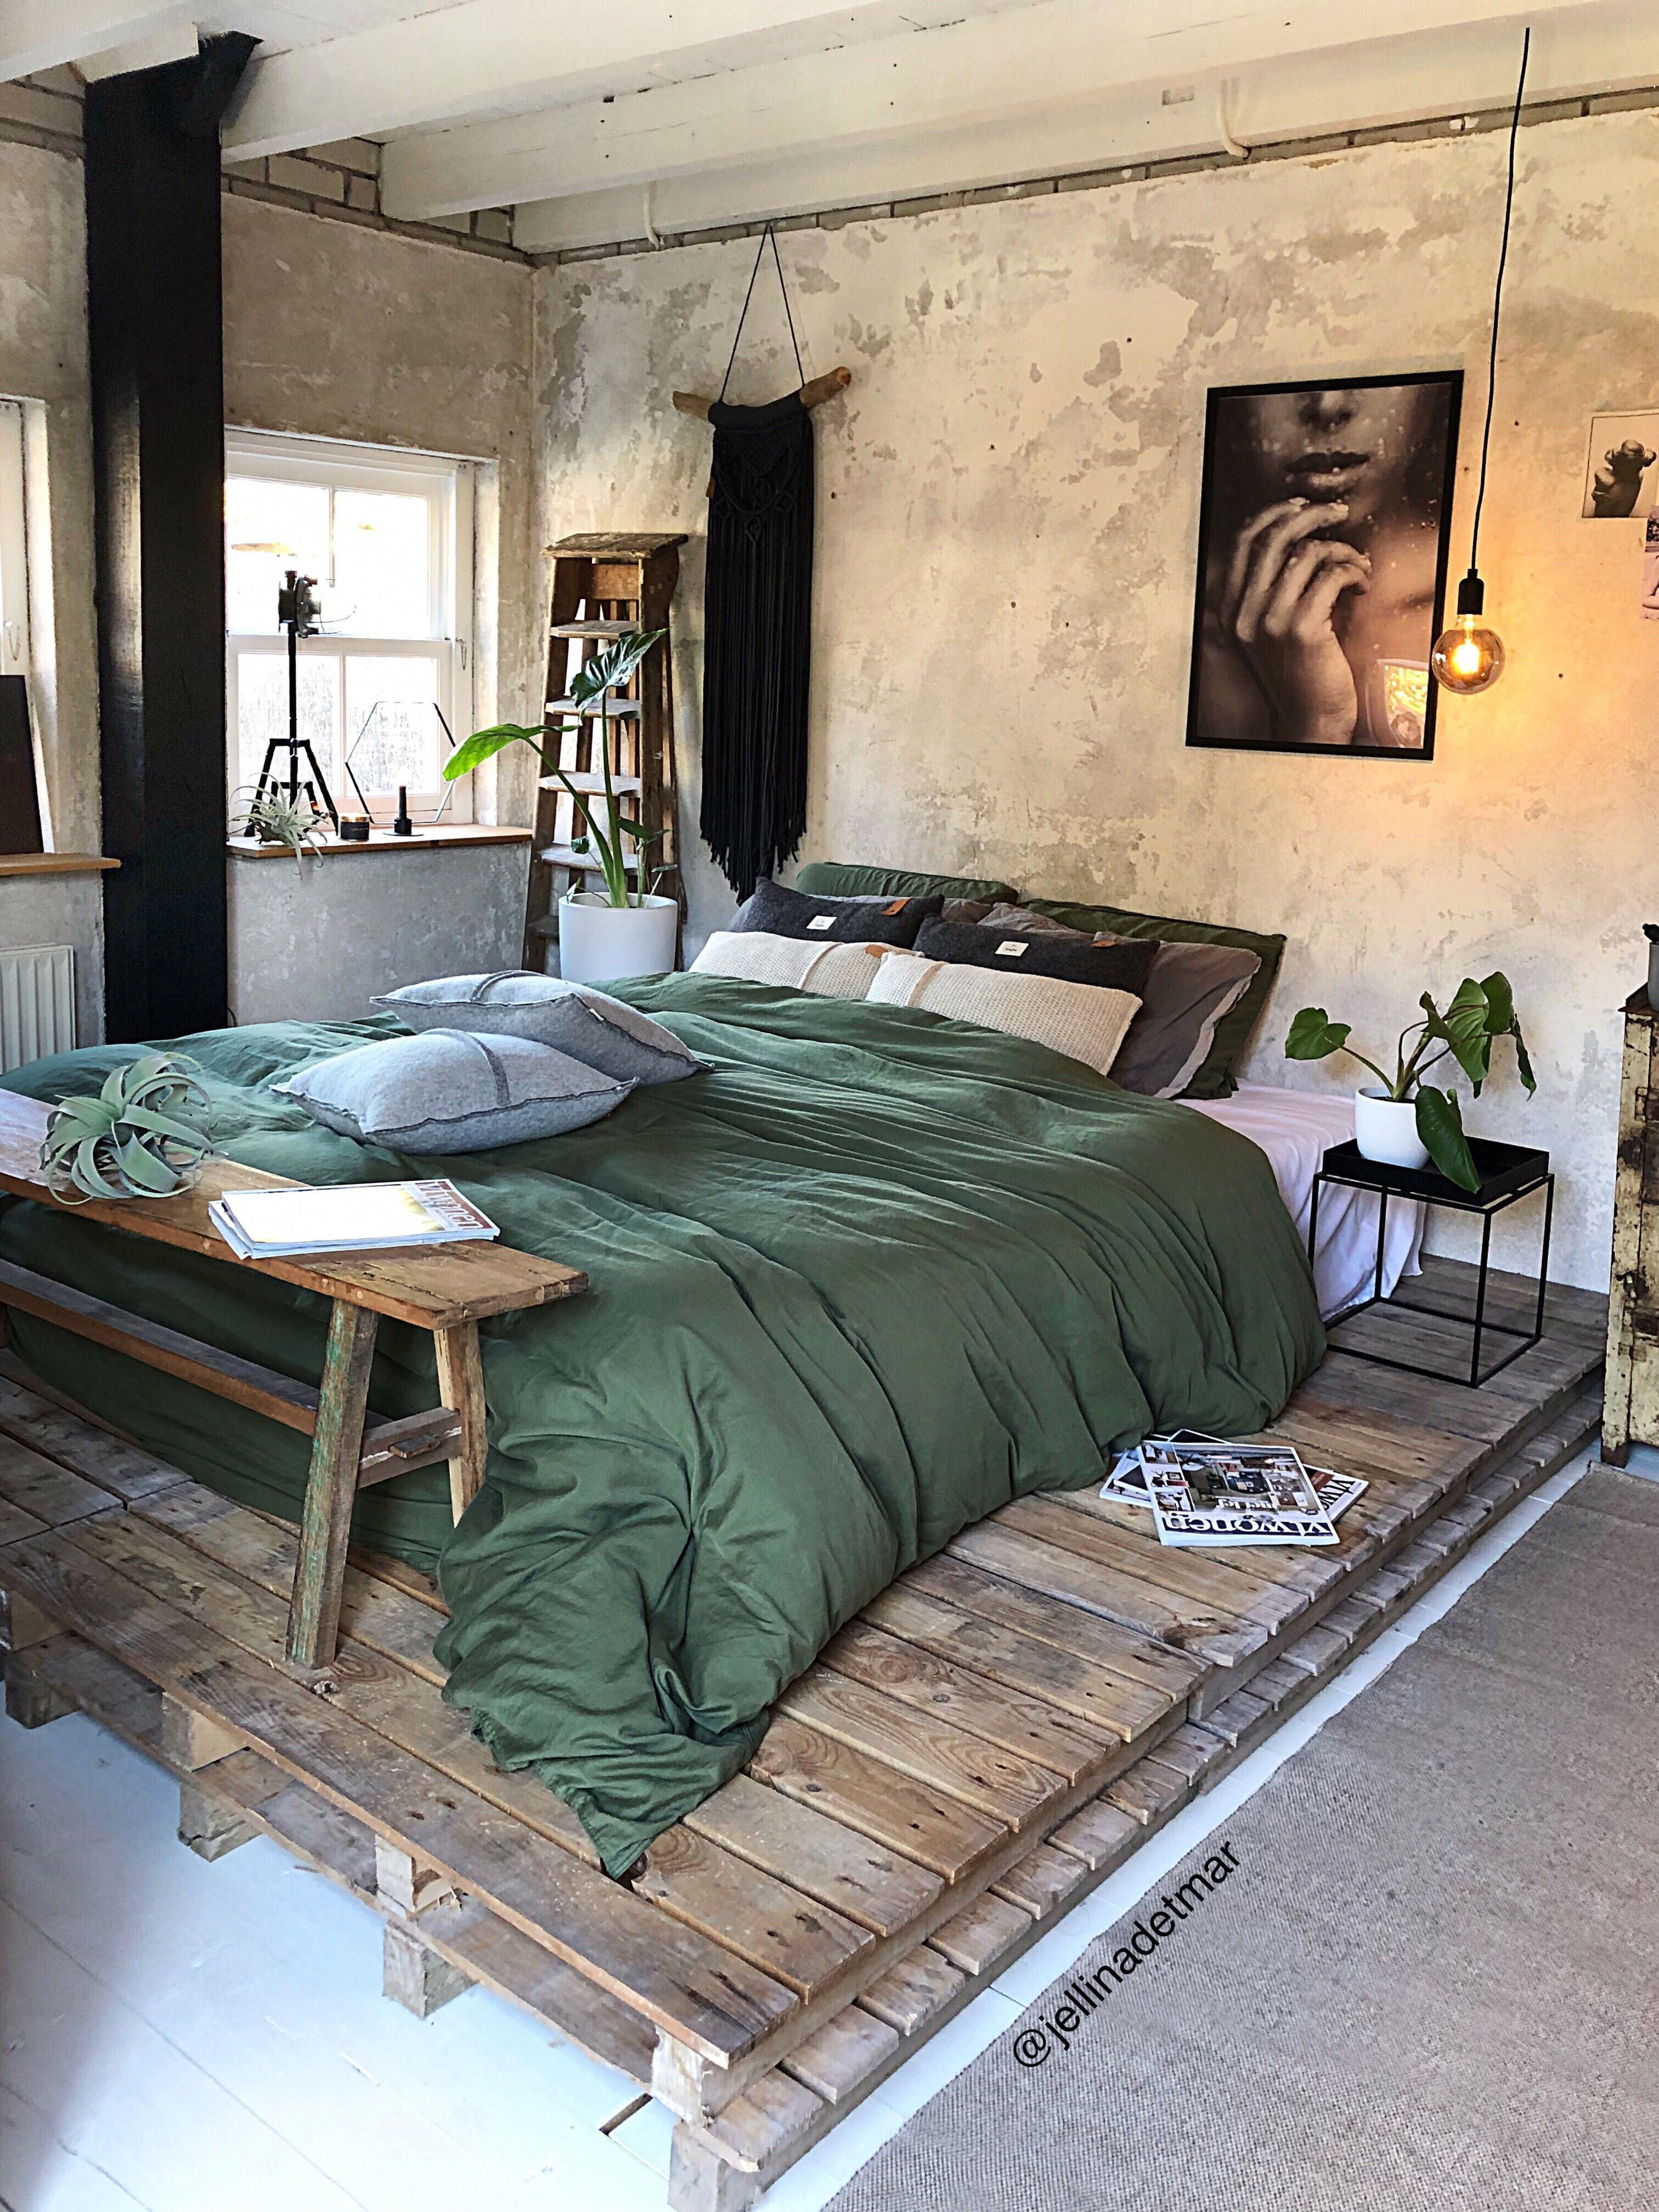 Budget Dining Room Decor With Images Loft Interior Design Industrial Bedroom Design Bed Design